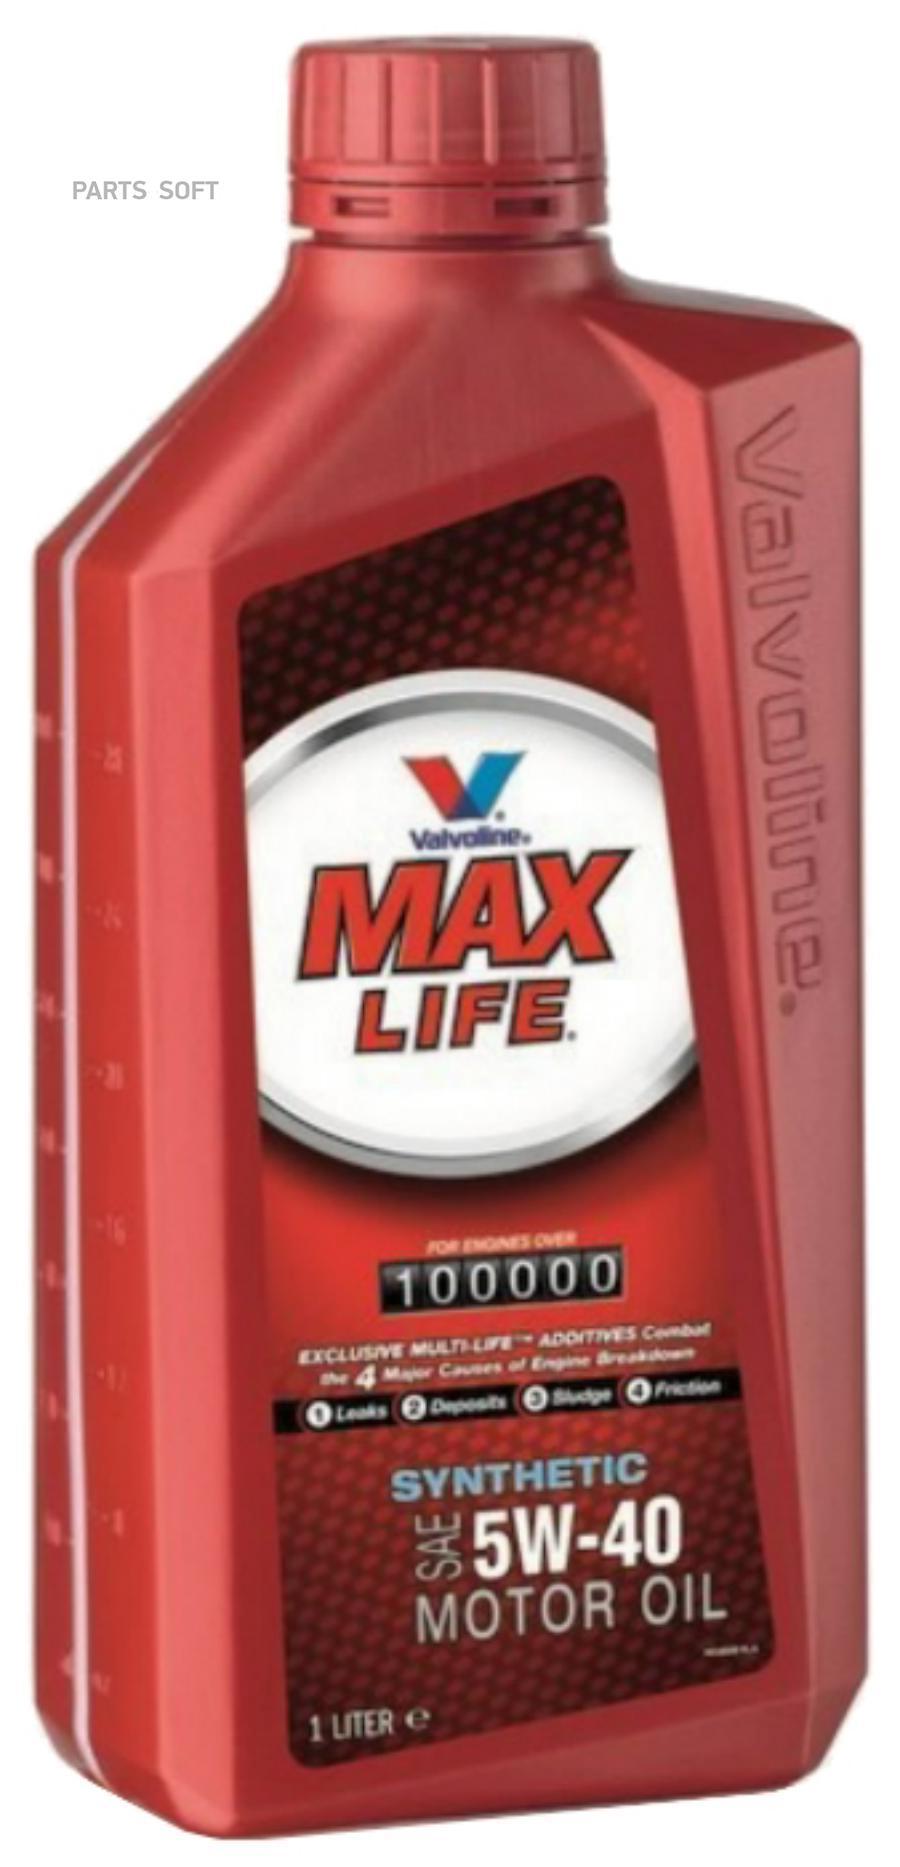 Моторное масло VALVOLINE MAX LIFE 5W-40 (1 л.) синтетика